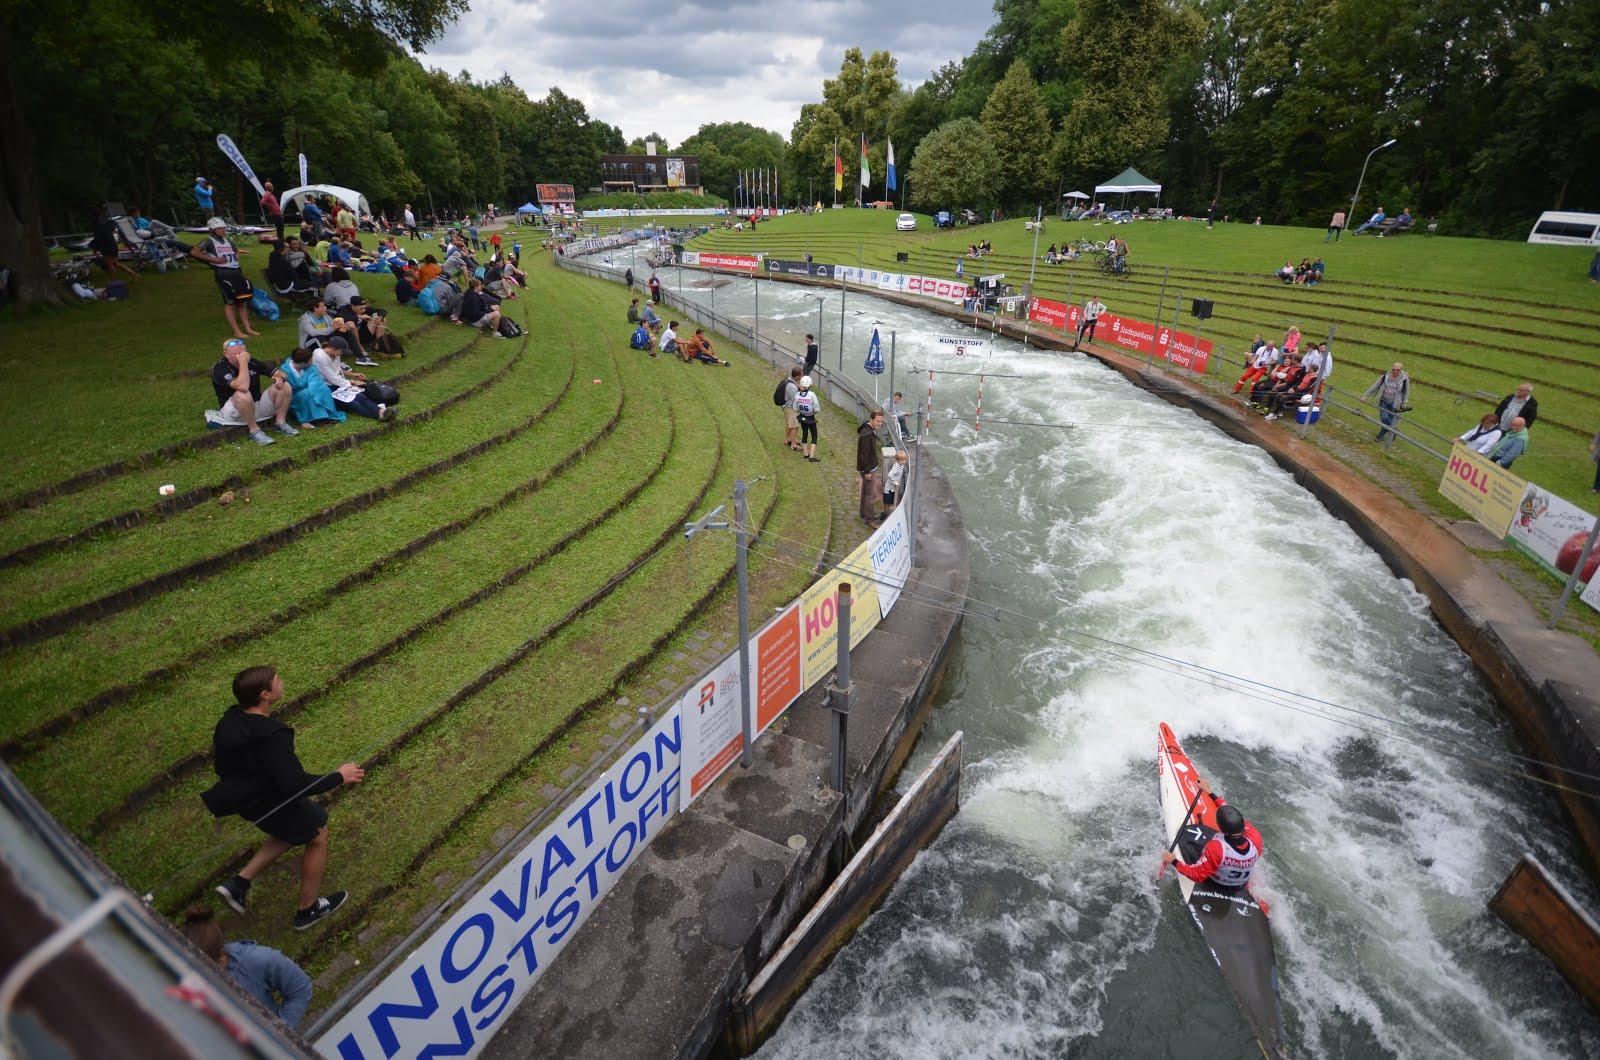 Hardys Augsburg canoe slalom nz junior u23 teams eca cup race 4 5 augsburg